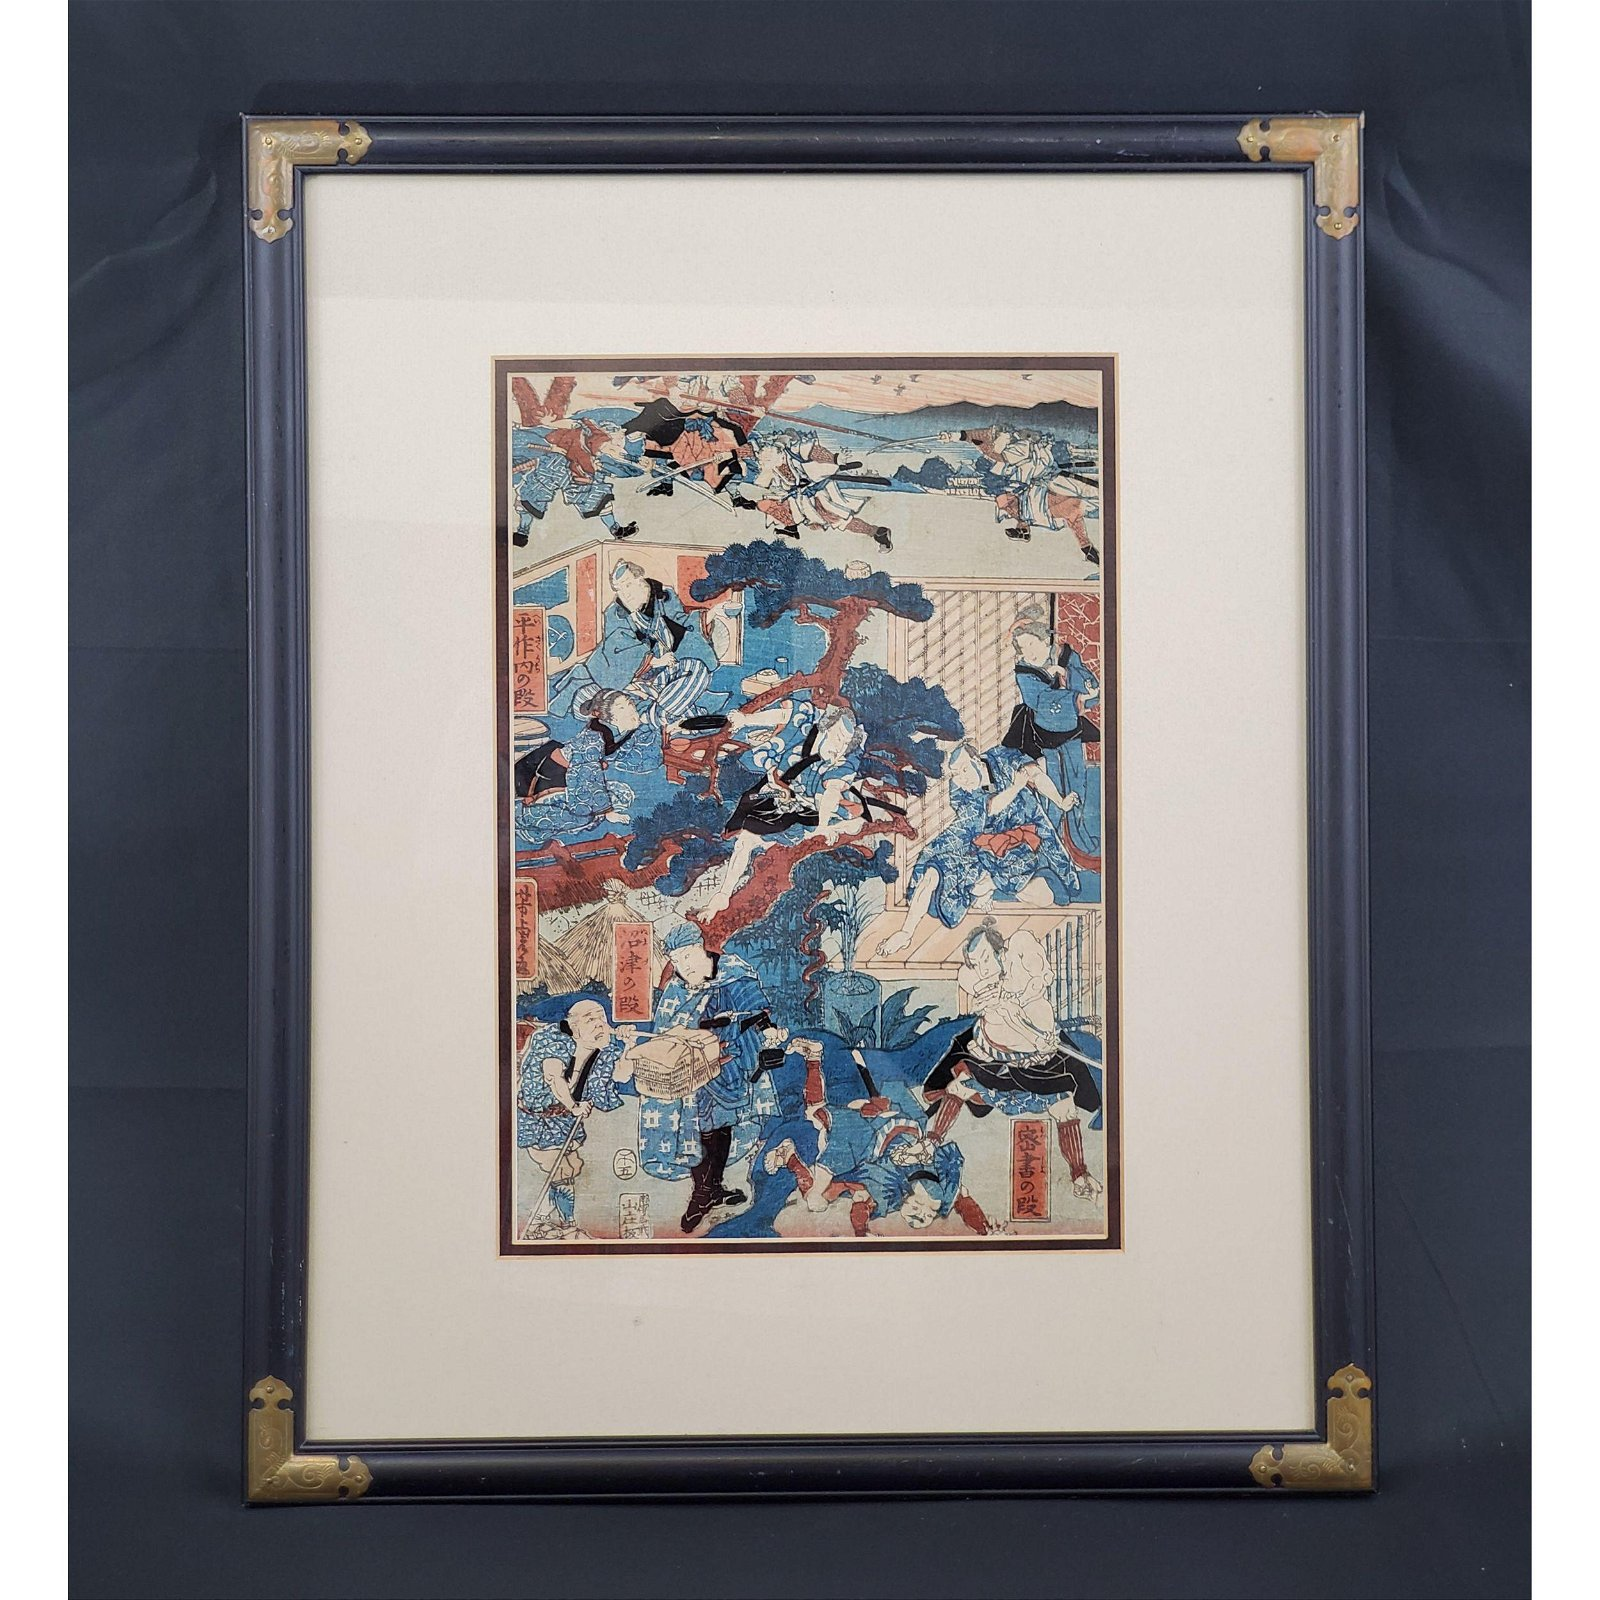 Signed Utagawa Yoshitora woodblock print active 1830-87